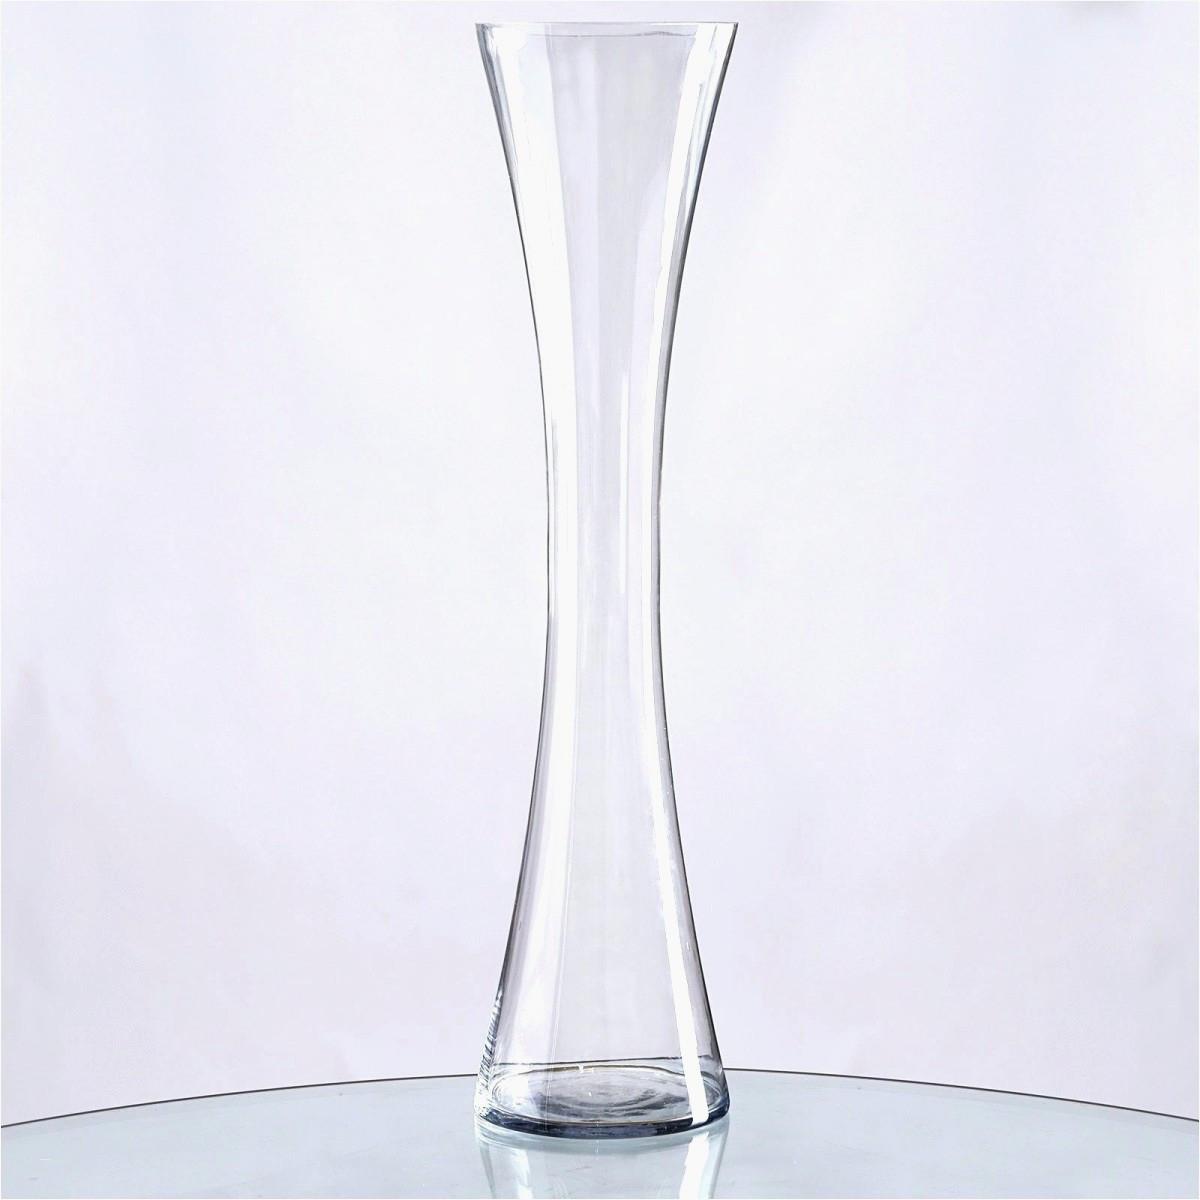 18 cylinder vases wholesale of 29 cheap center tables for living room norwin home design for glass center table amazing living room vases wholesale elegant cheap glass vases 1h vasesi 0d